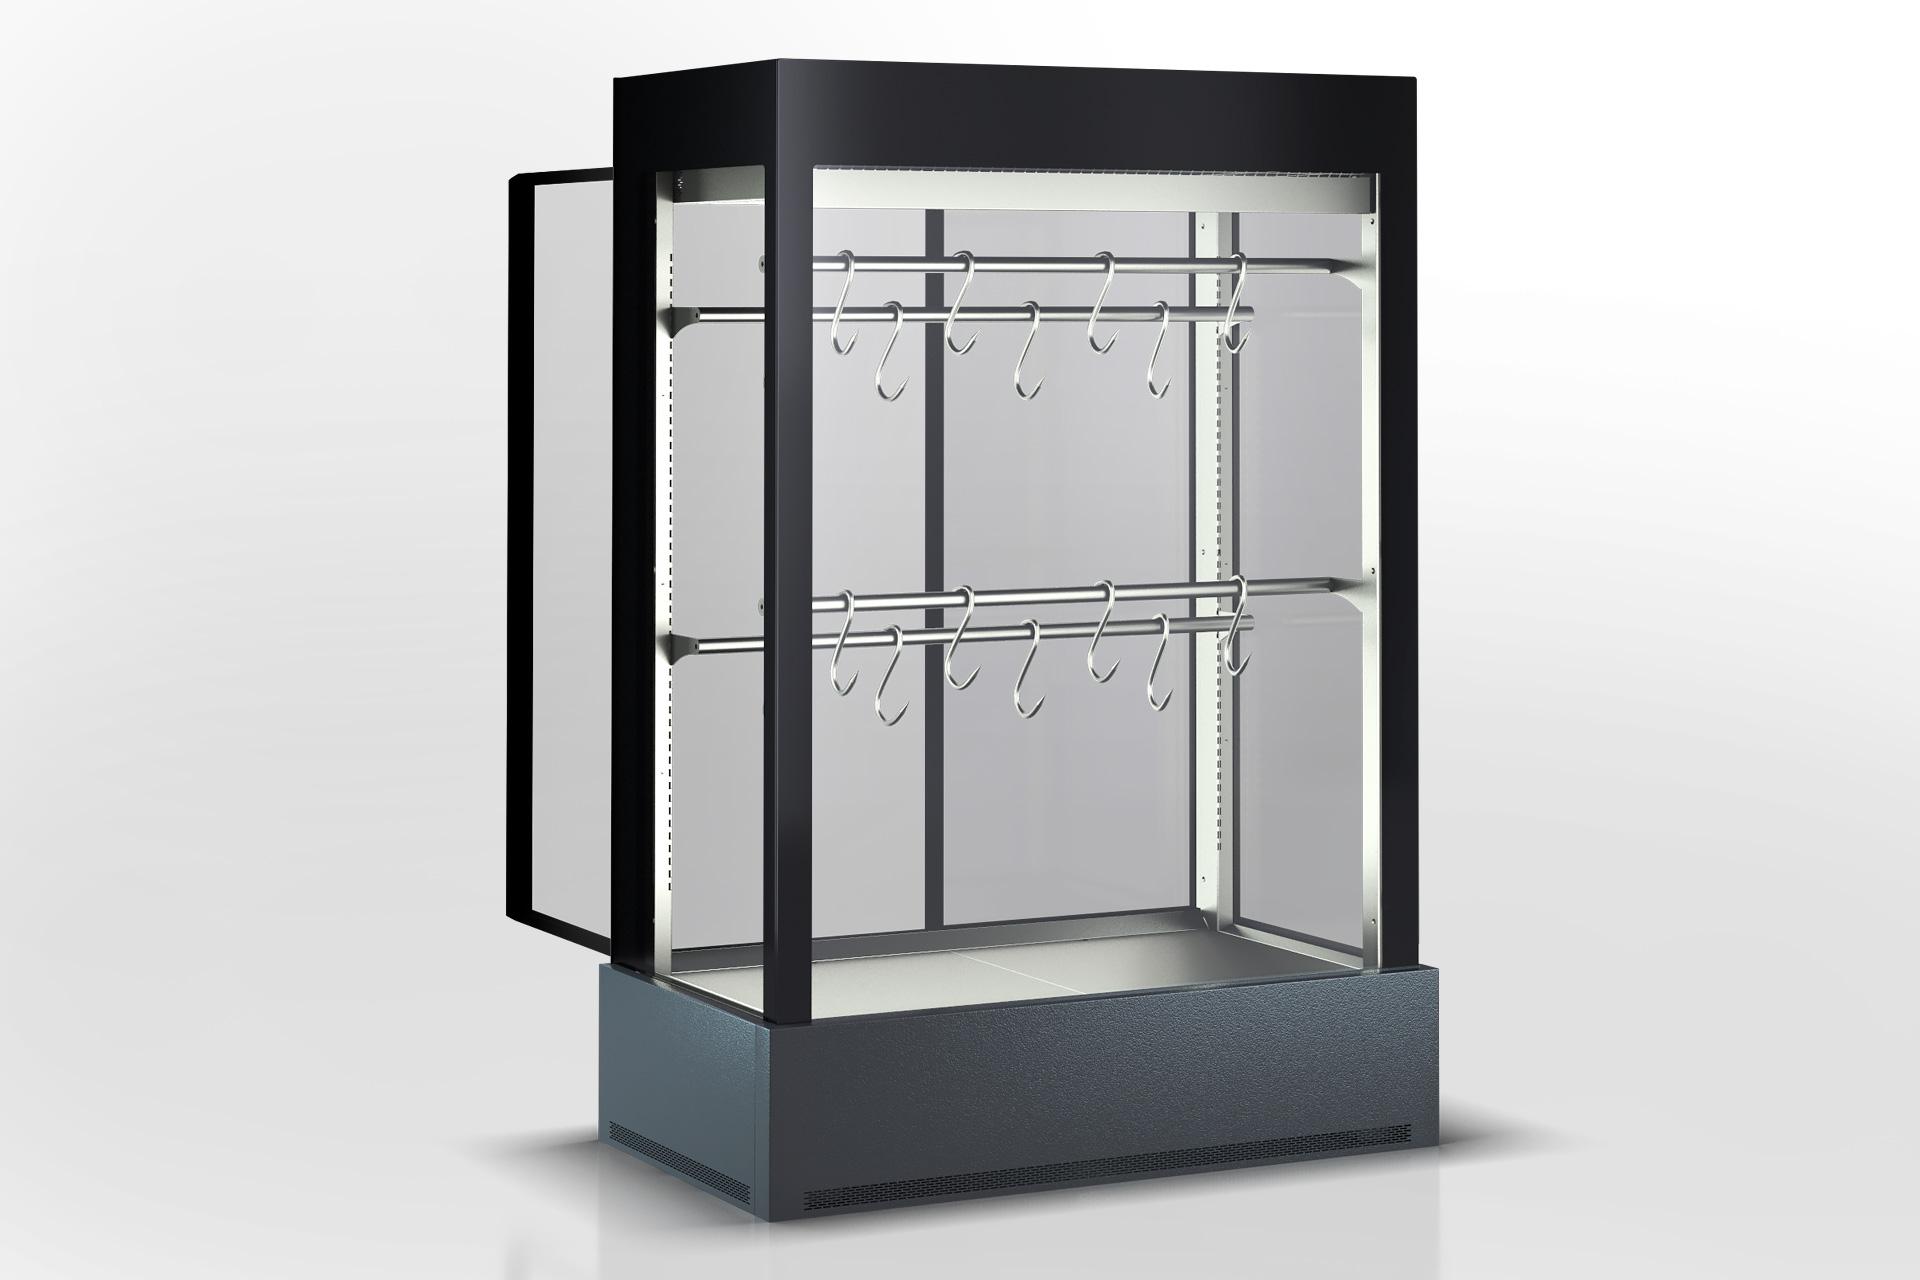 Холодильні шафи Kansas А4SG 078 meat 2HD (option)